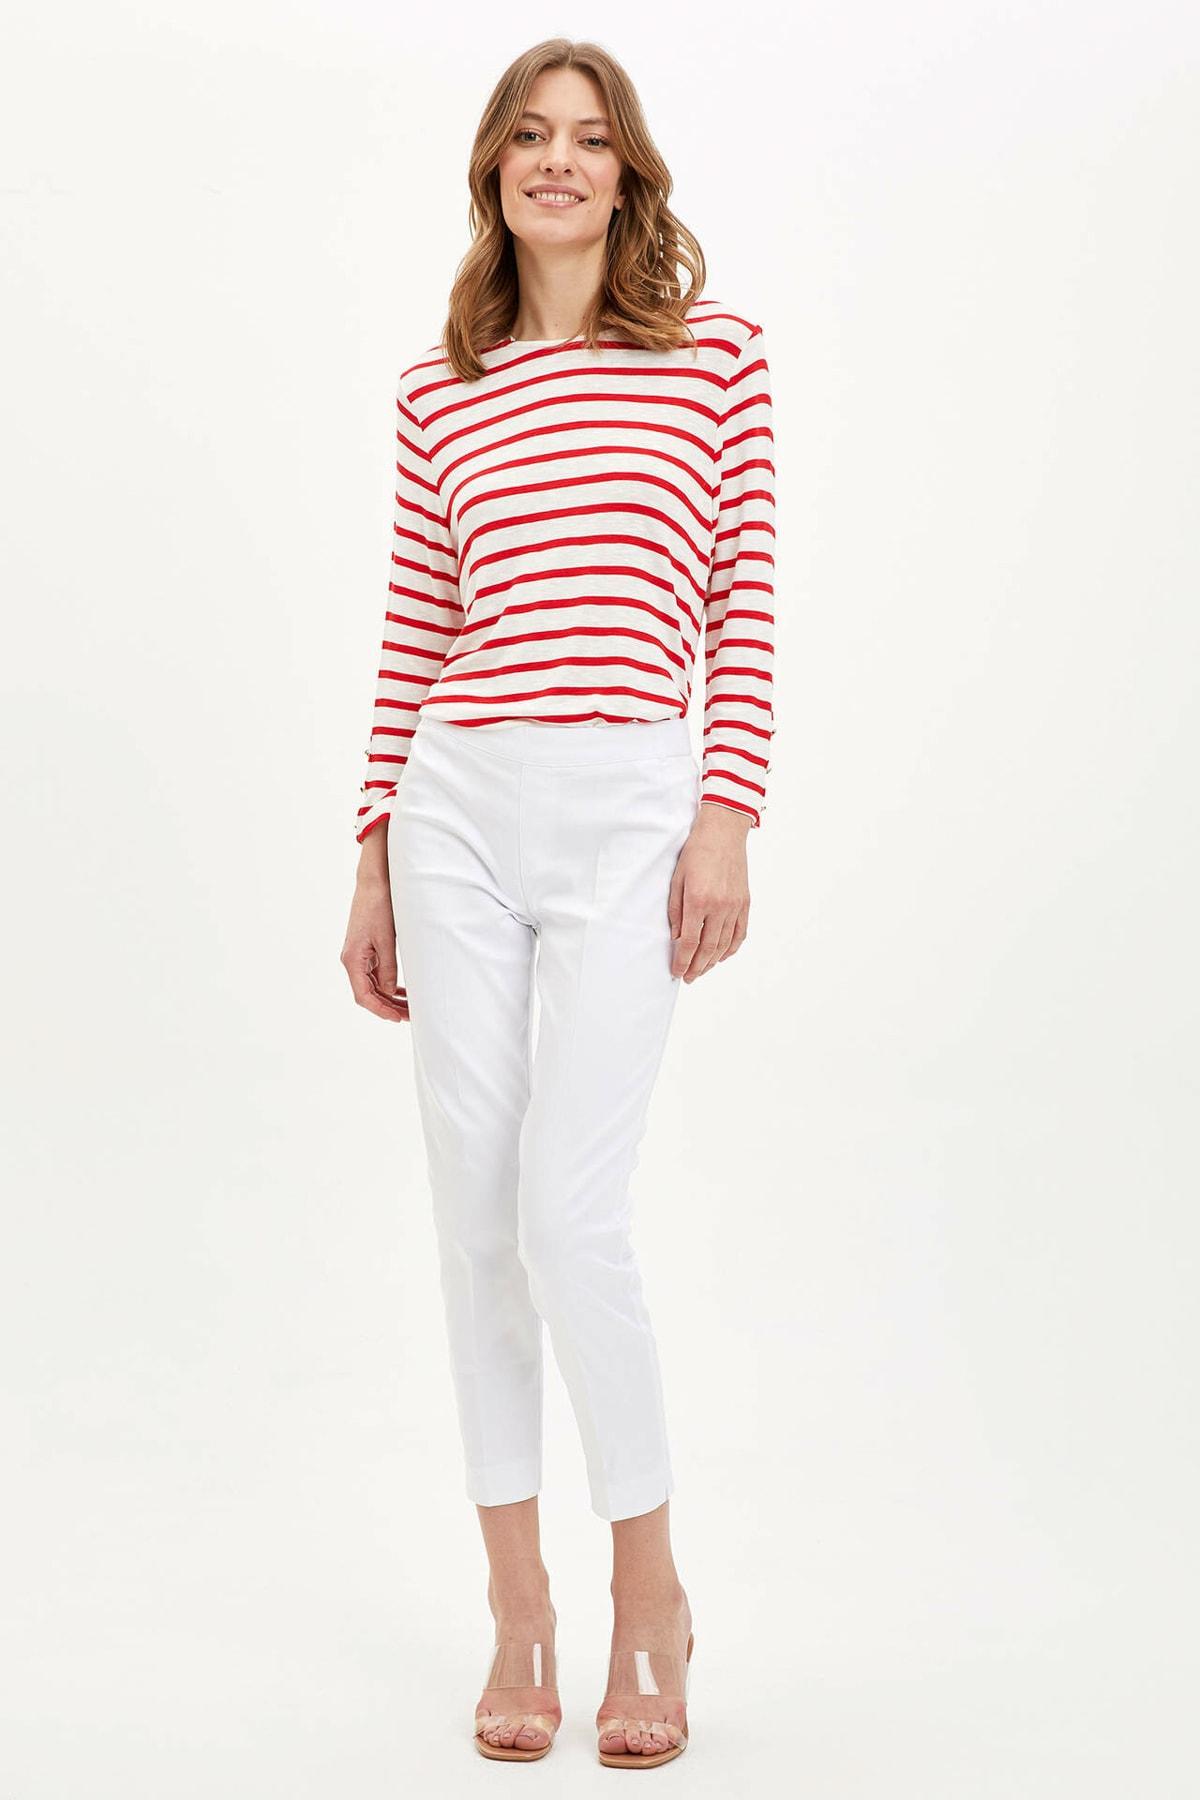 DeFacto Kadın Kırmızı Çizgili Uzun Kollu T-Shirt R3672AZ.20SP.RD227 2